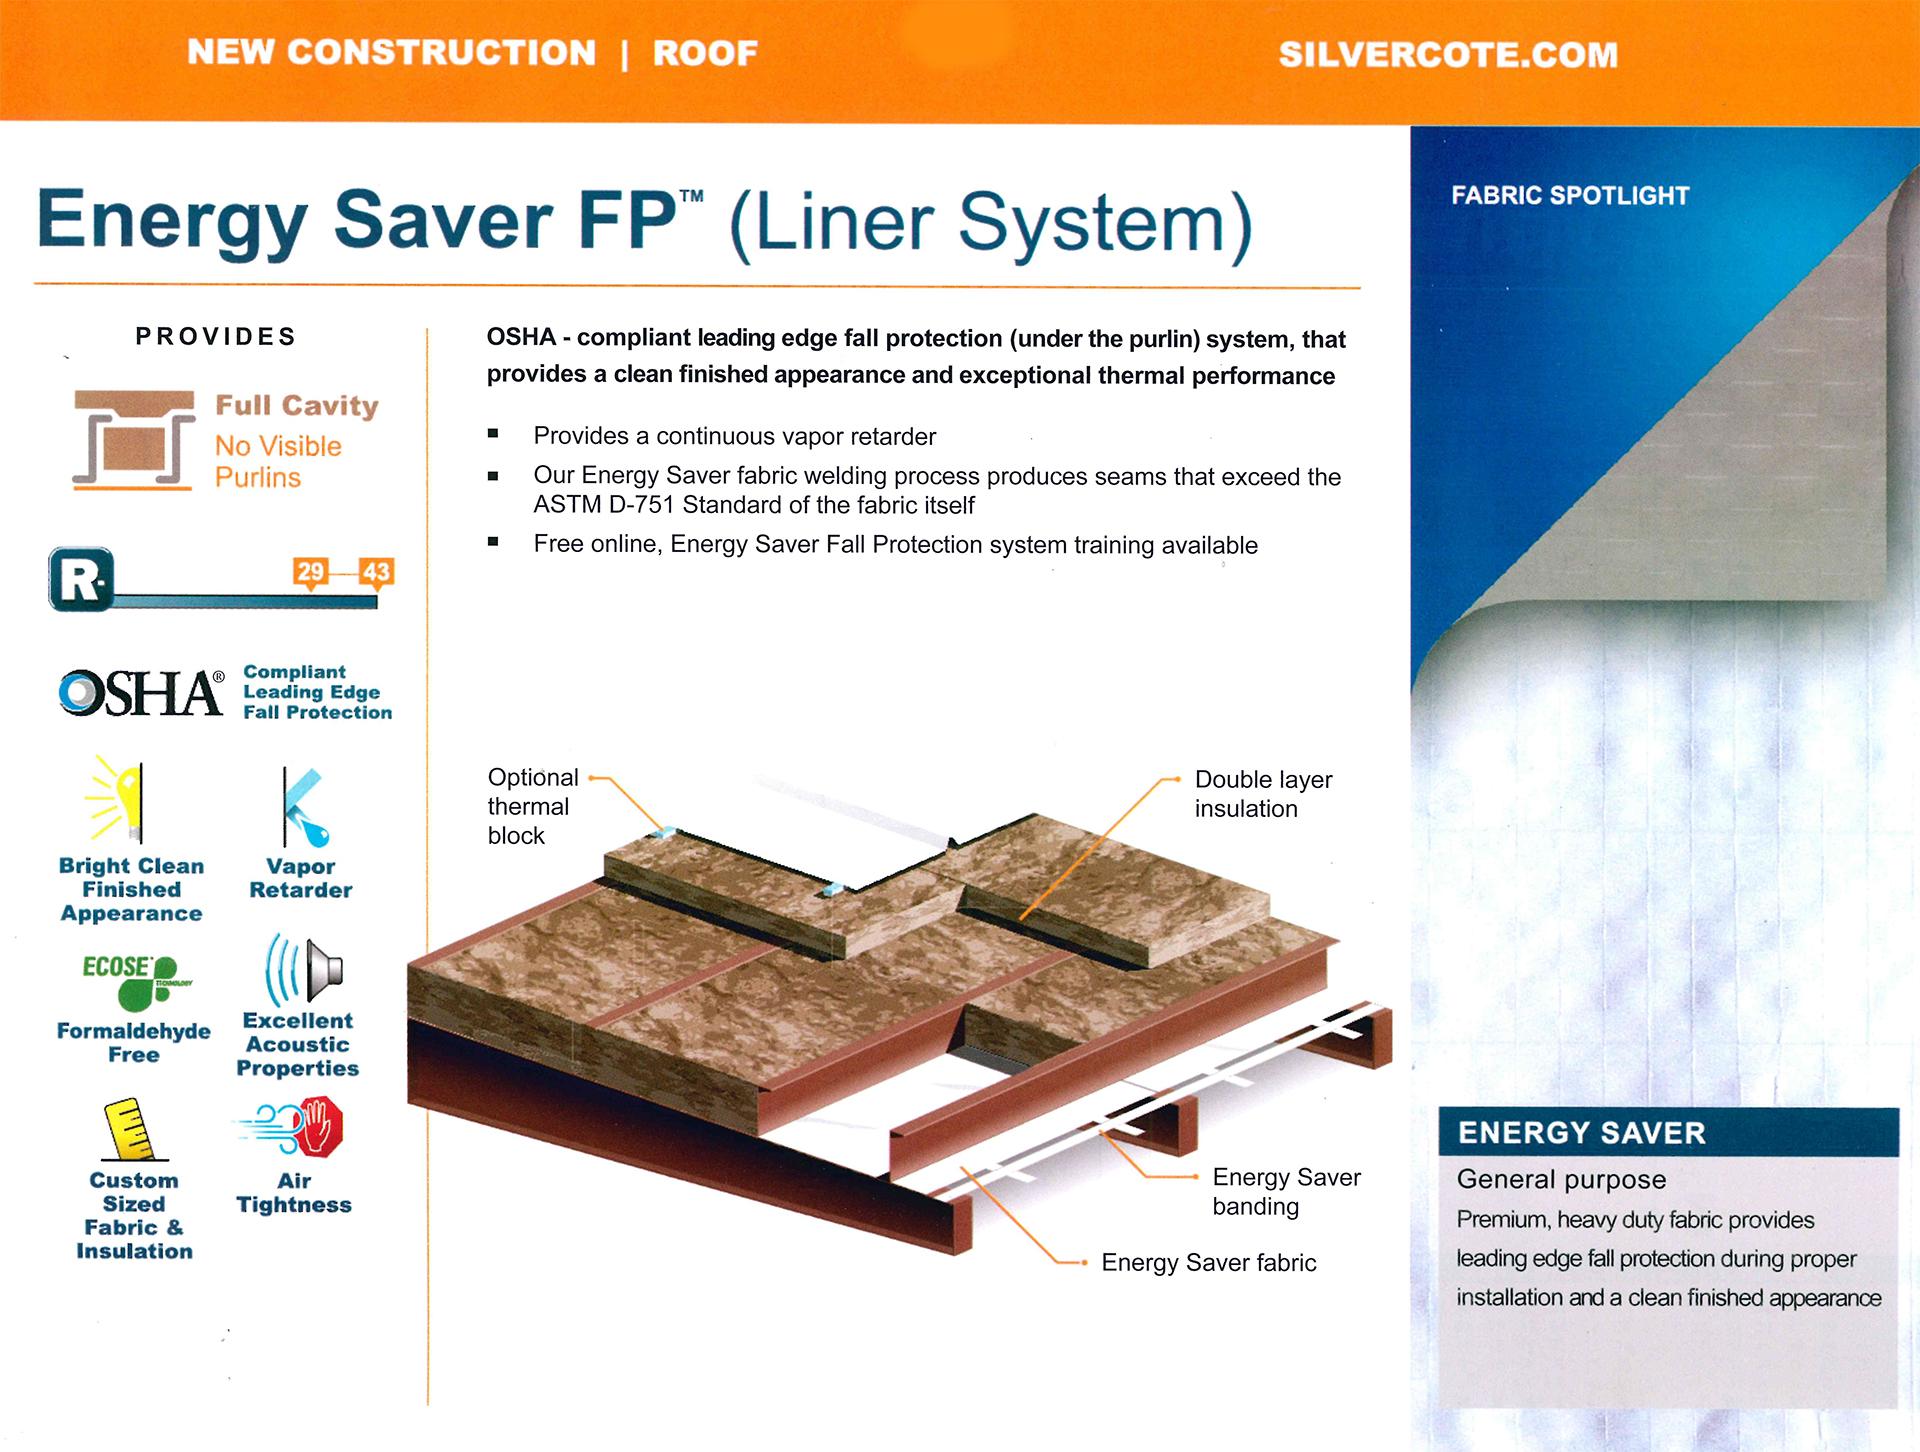 Energy Saver FP Liner Panel